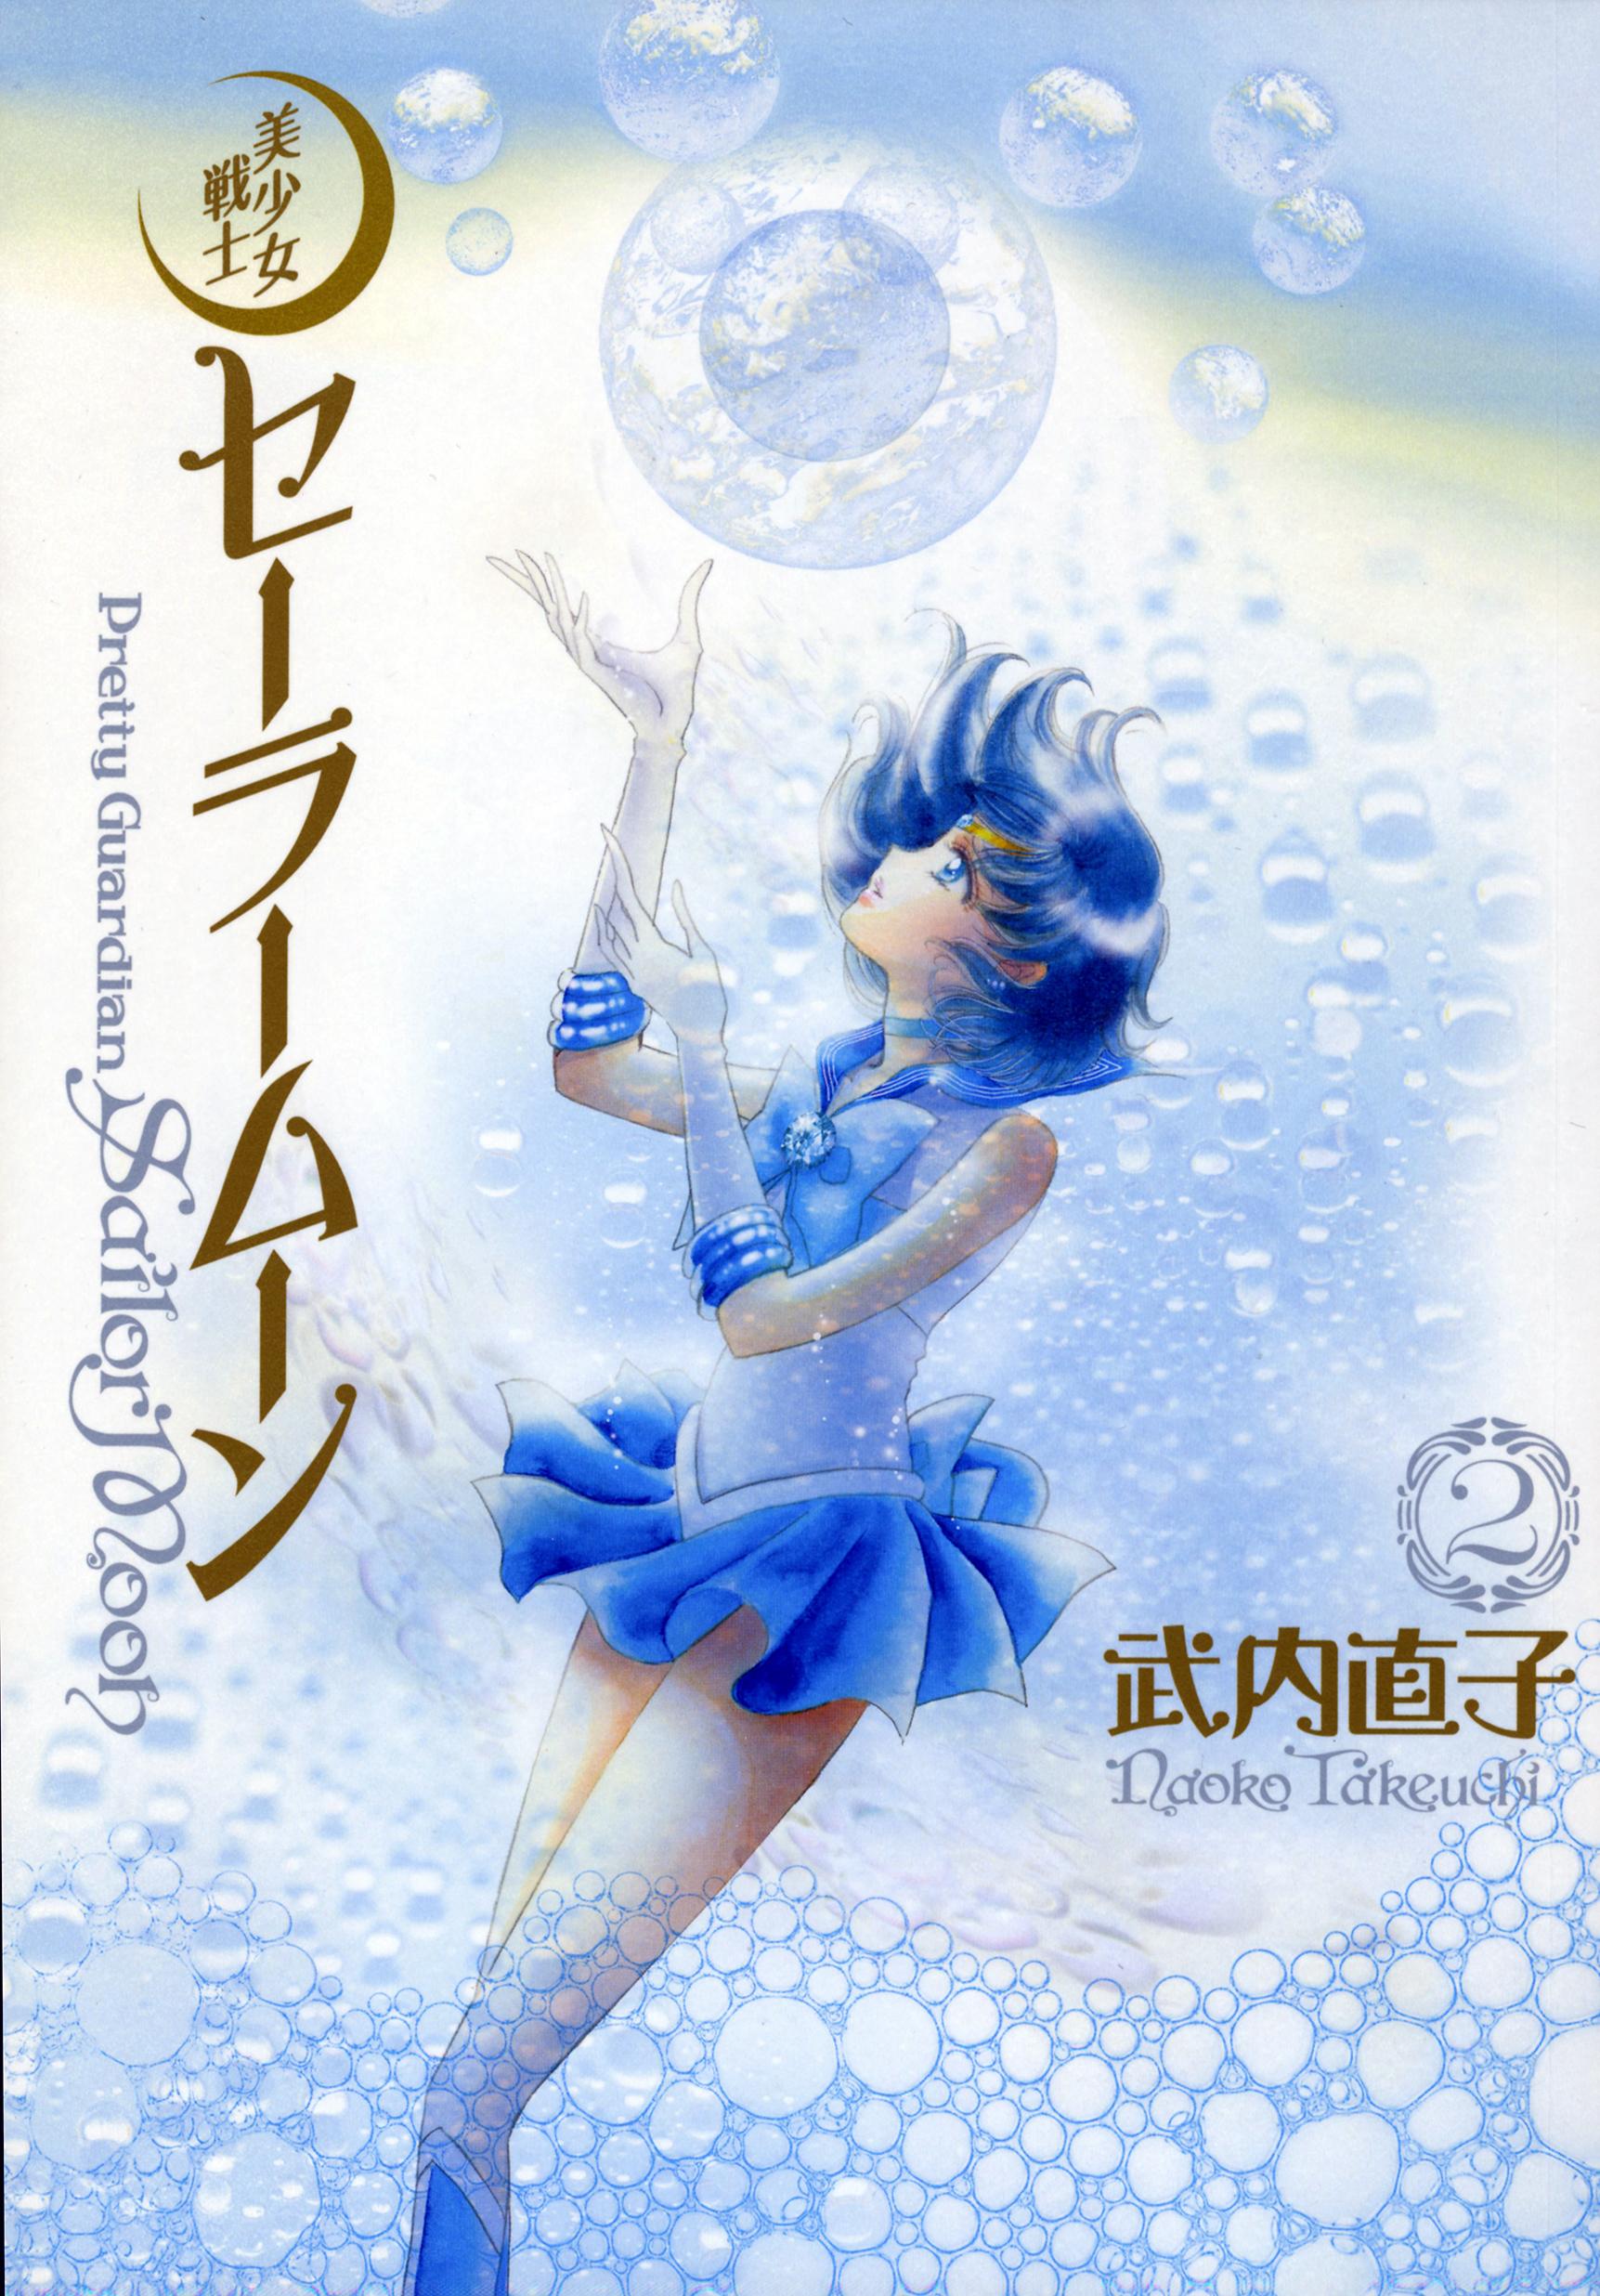 Sailor Moon Kanzenban (20th Anniversary Edition) & Sailor Moon Norma Editorial 645362u3u69